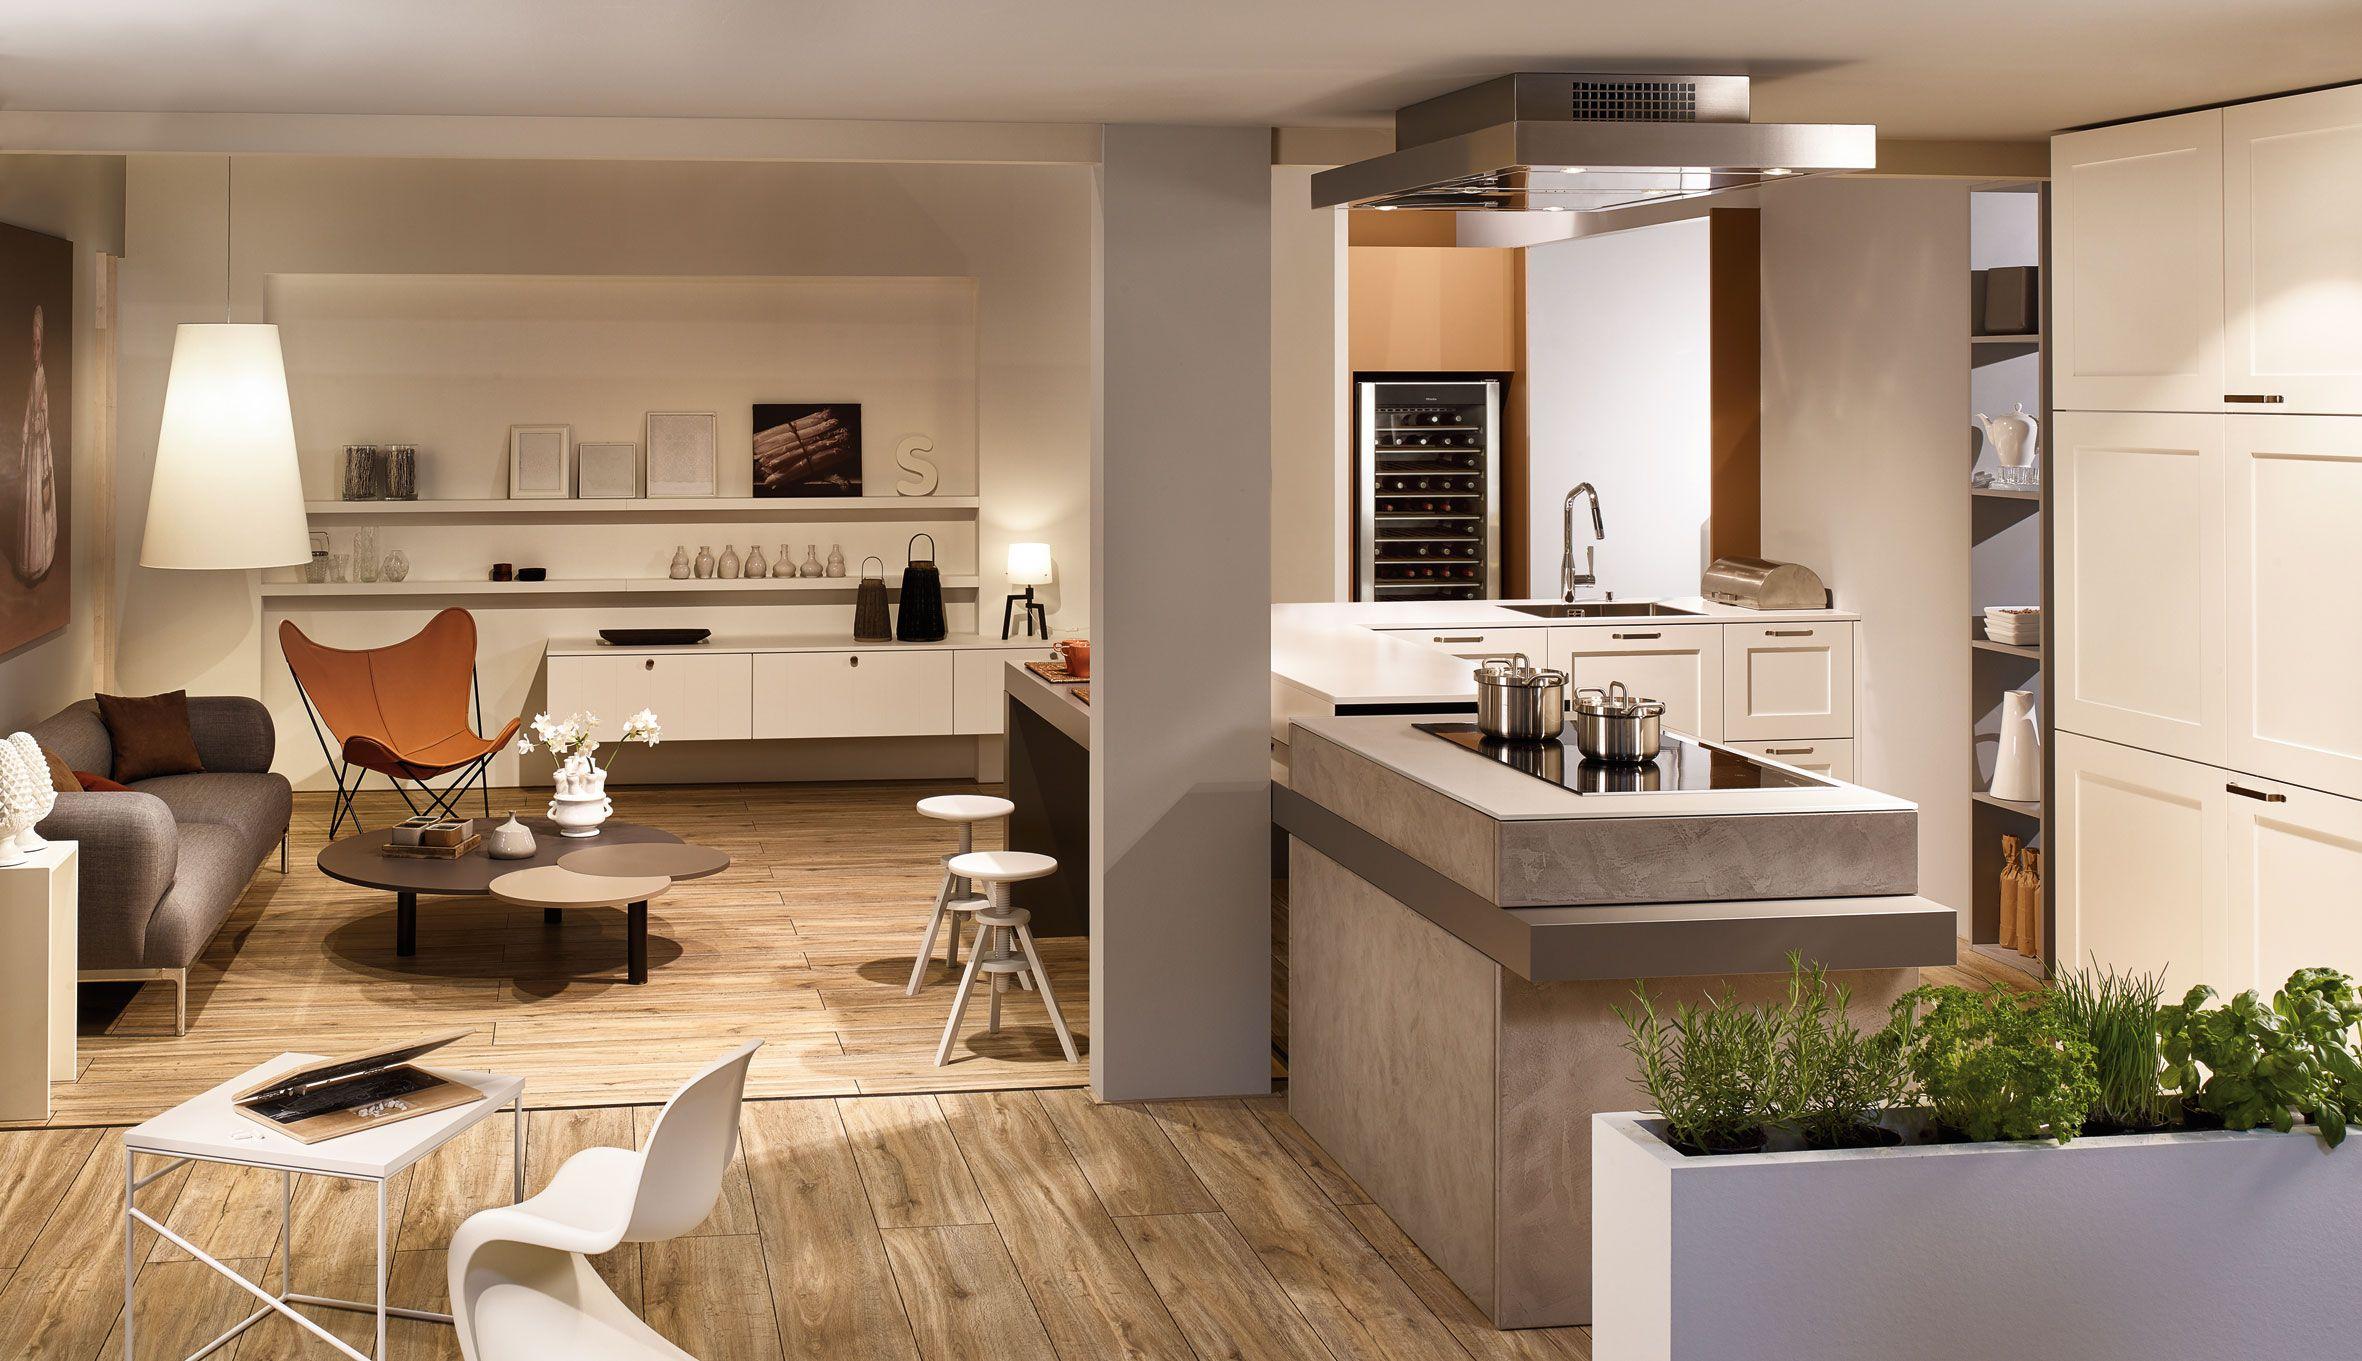 Kh Küche Seidenmatt Lackiert Verkehrsweiss Beton Grau Kh Kitchen Silky Matt Lacquered Traffic White Concrete Grey